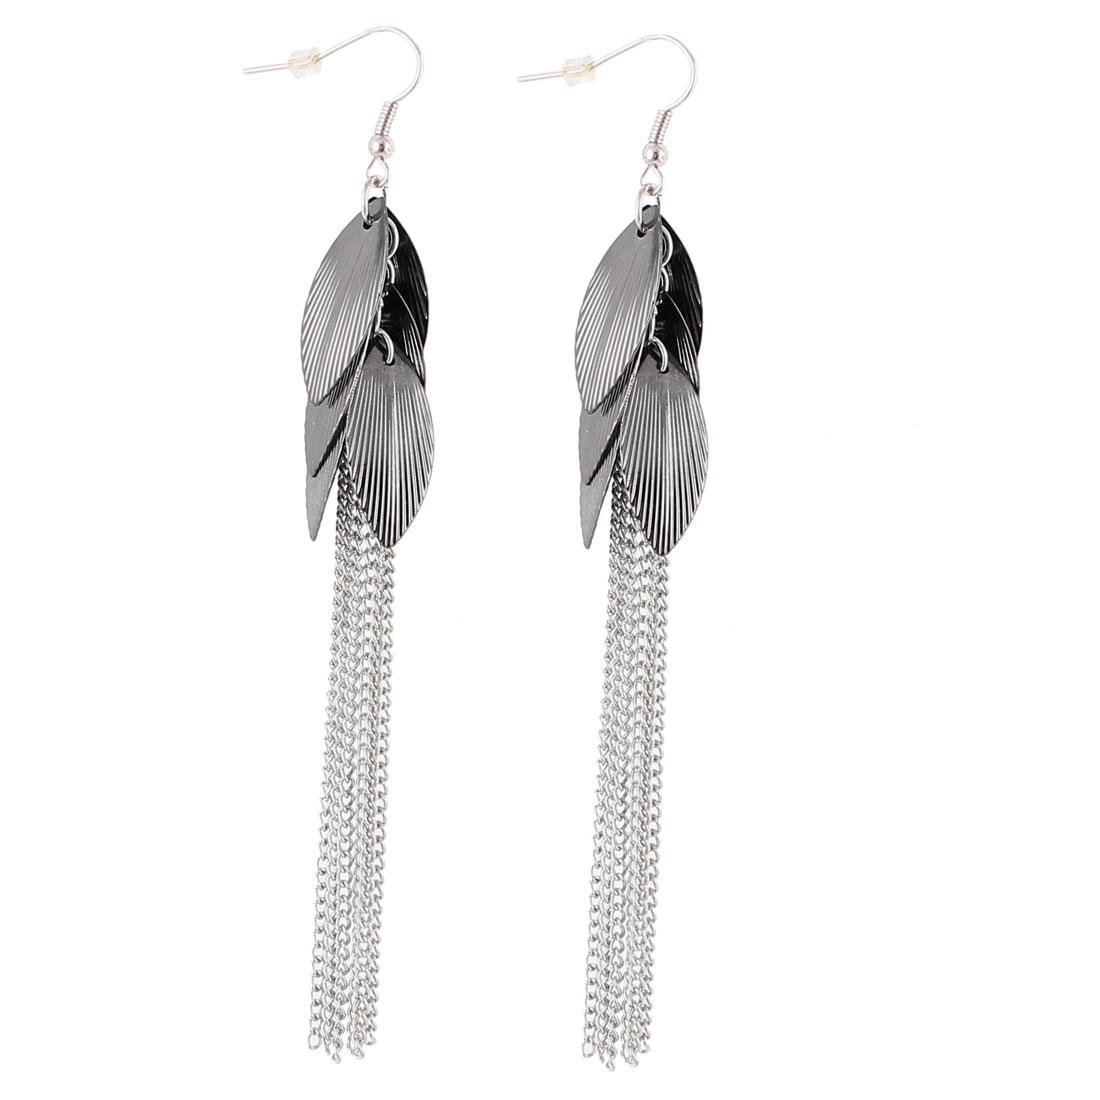 "Woman Black Metal Chain Tassels Leaves Shape Dangling Pendant Fish Hook Earrings Earbob Silver Tone 4.7"" Length Pair"